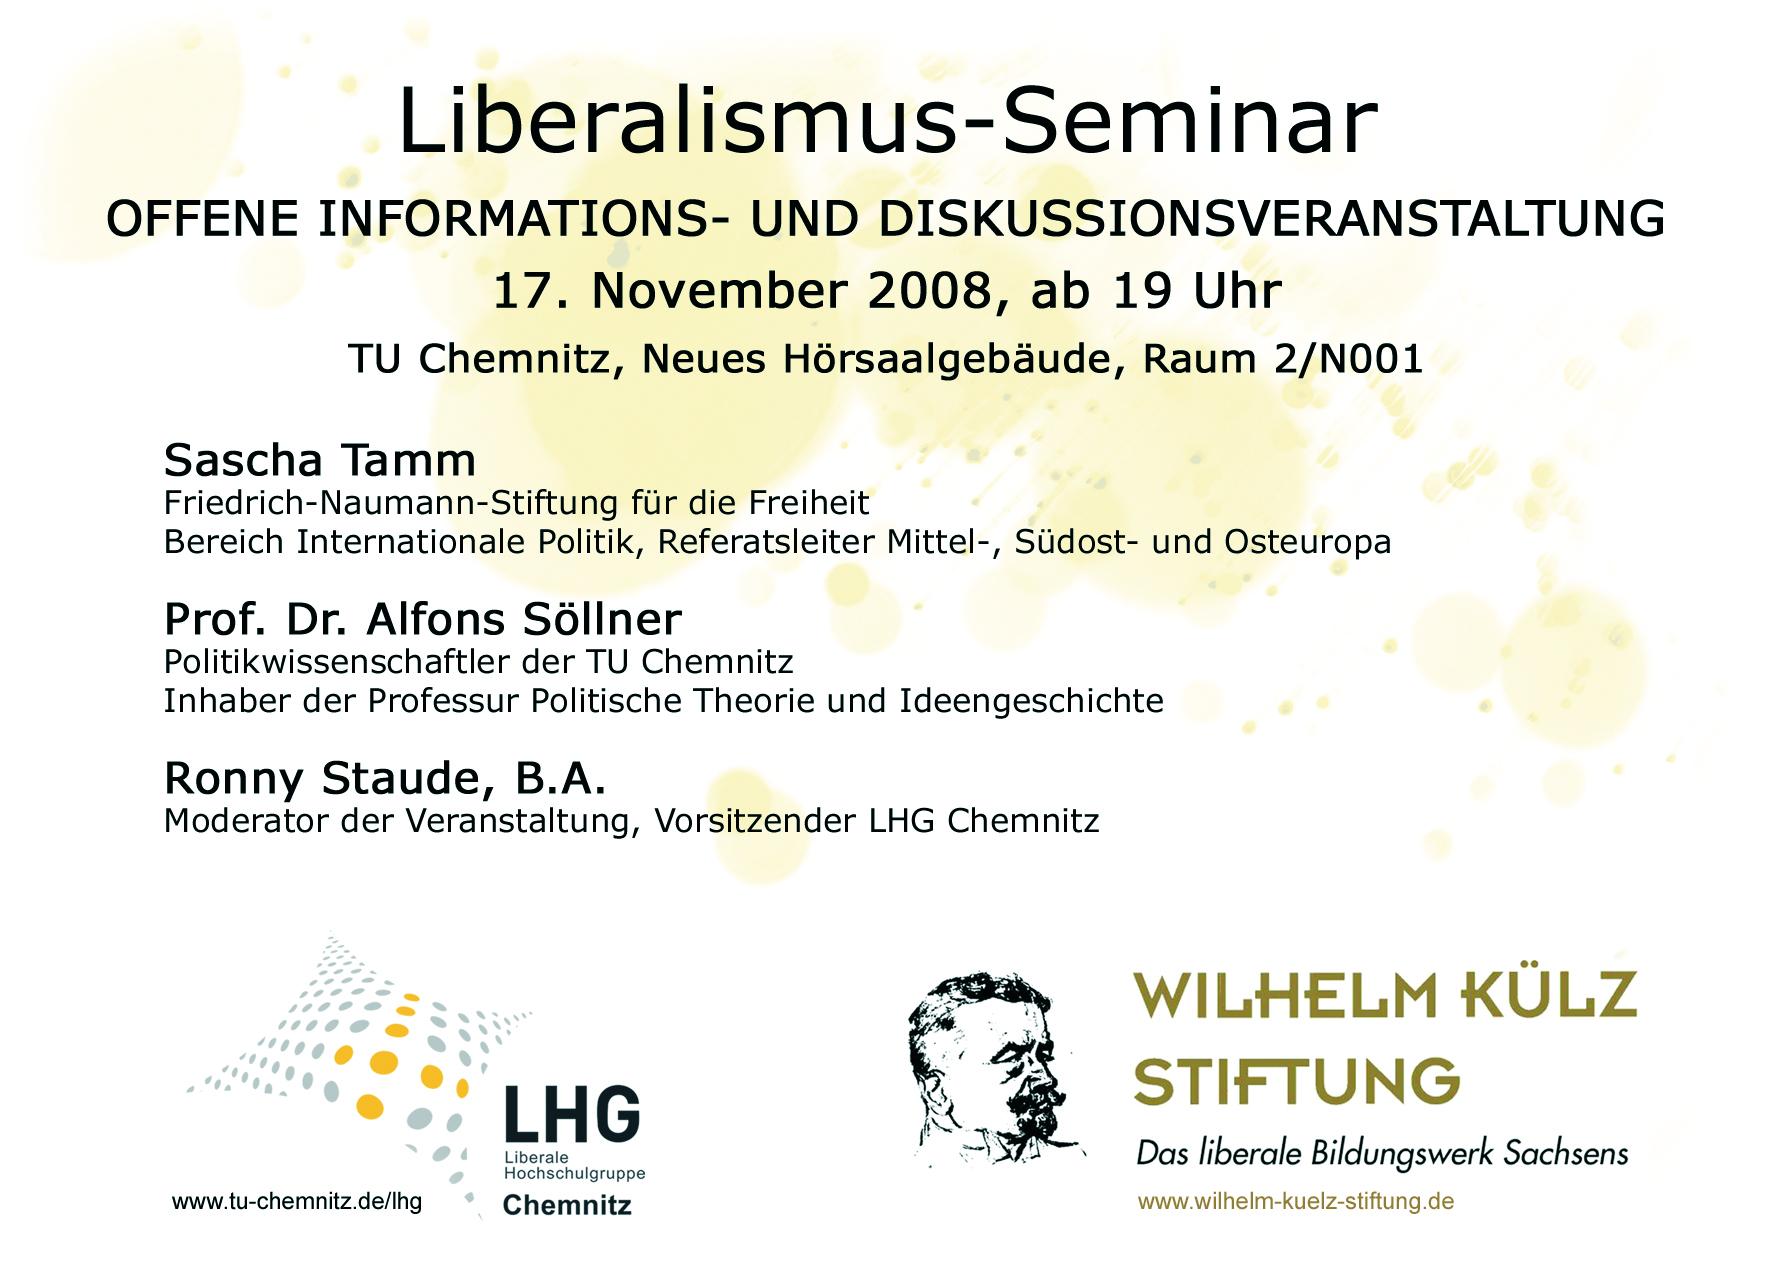 Liberale Hochschulgruppe Chemnitz (LHG Chemnitz)